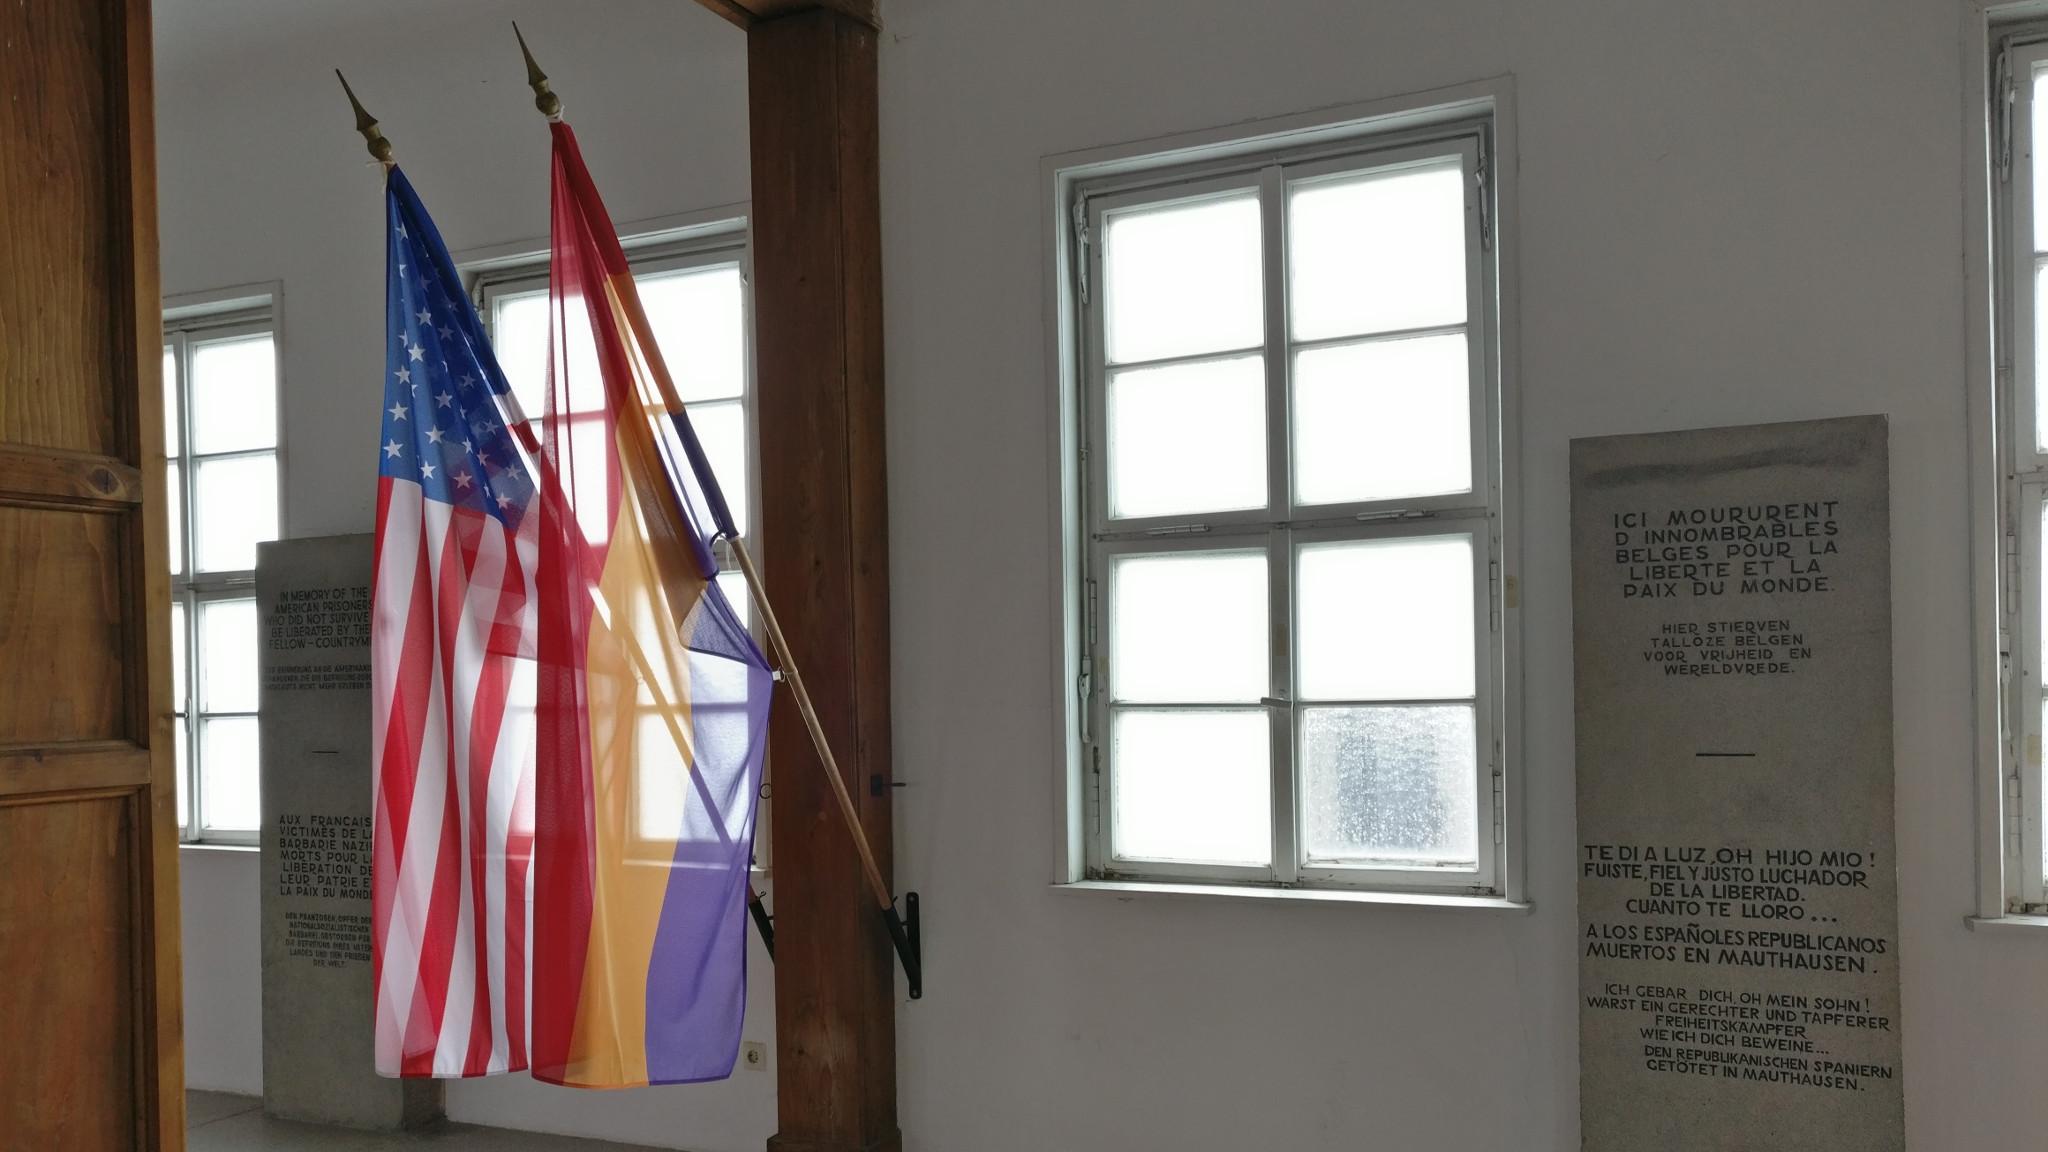 Spanish Second Republic flag in Mauthausen